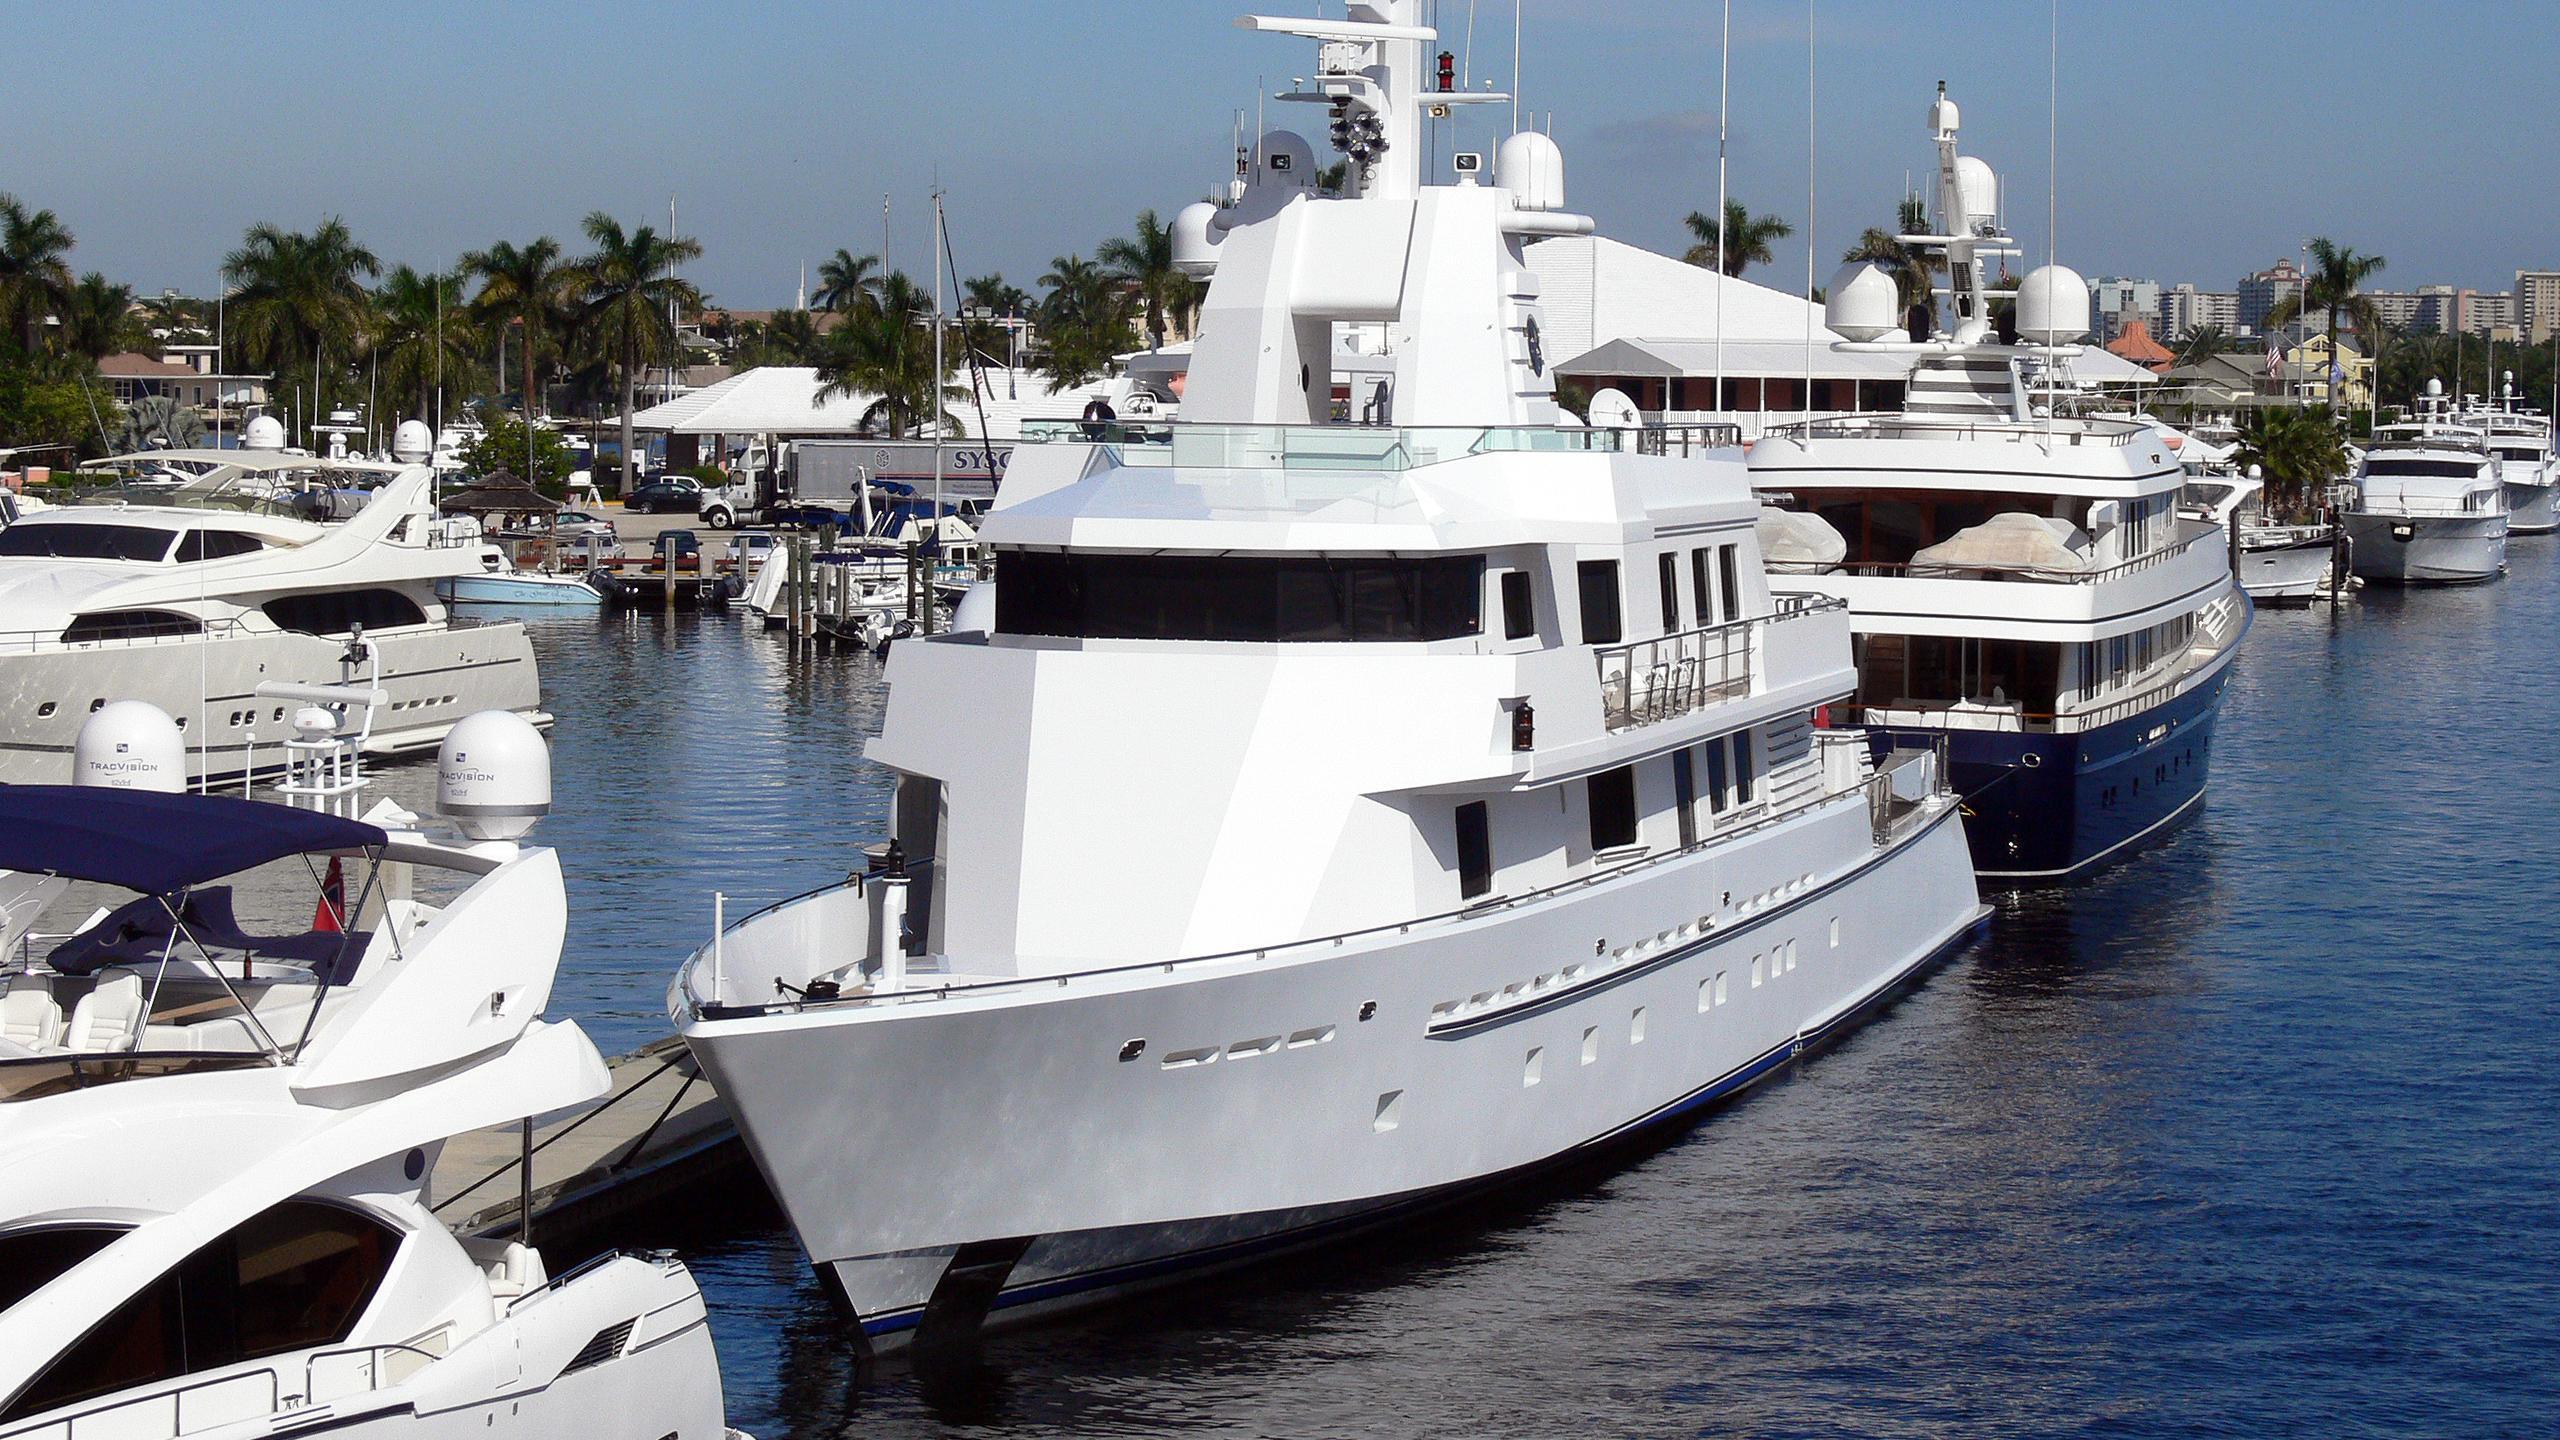 mizu-sea-bowld-motor-yacht-oceanfast-2004-53m-bow